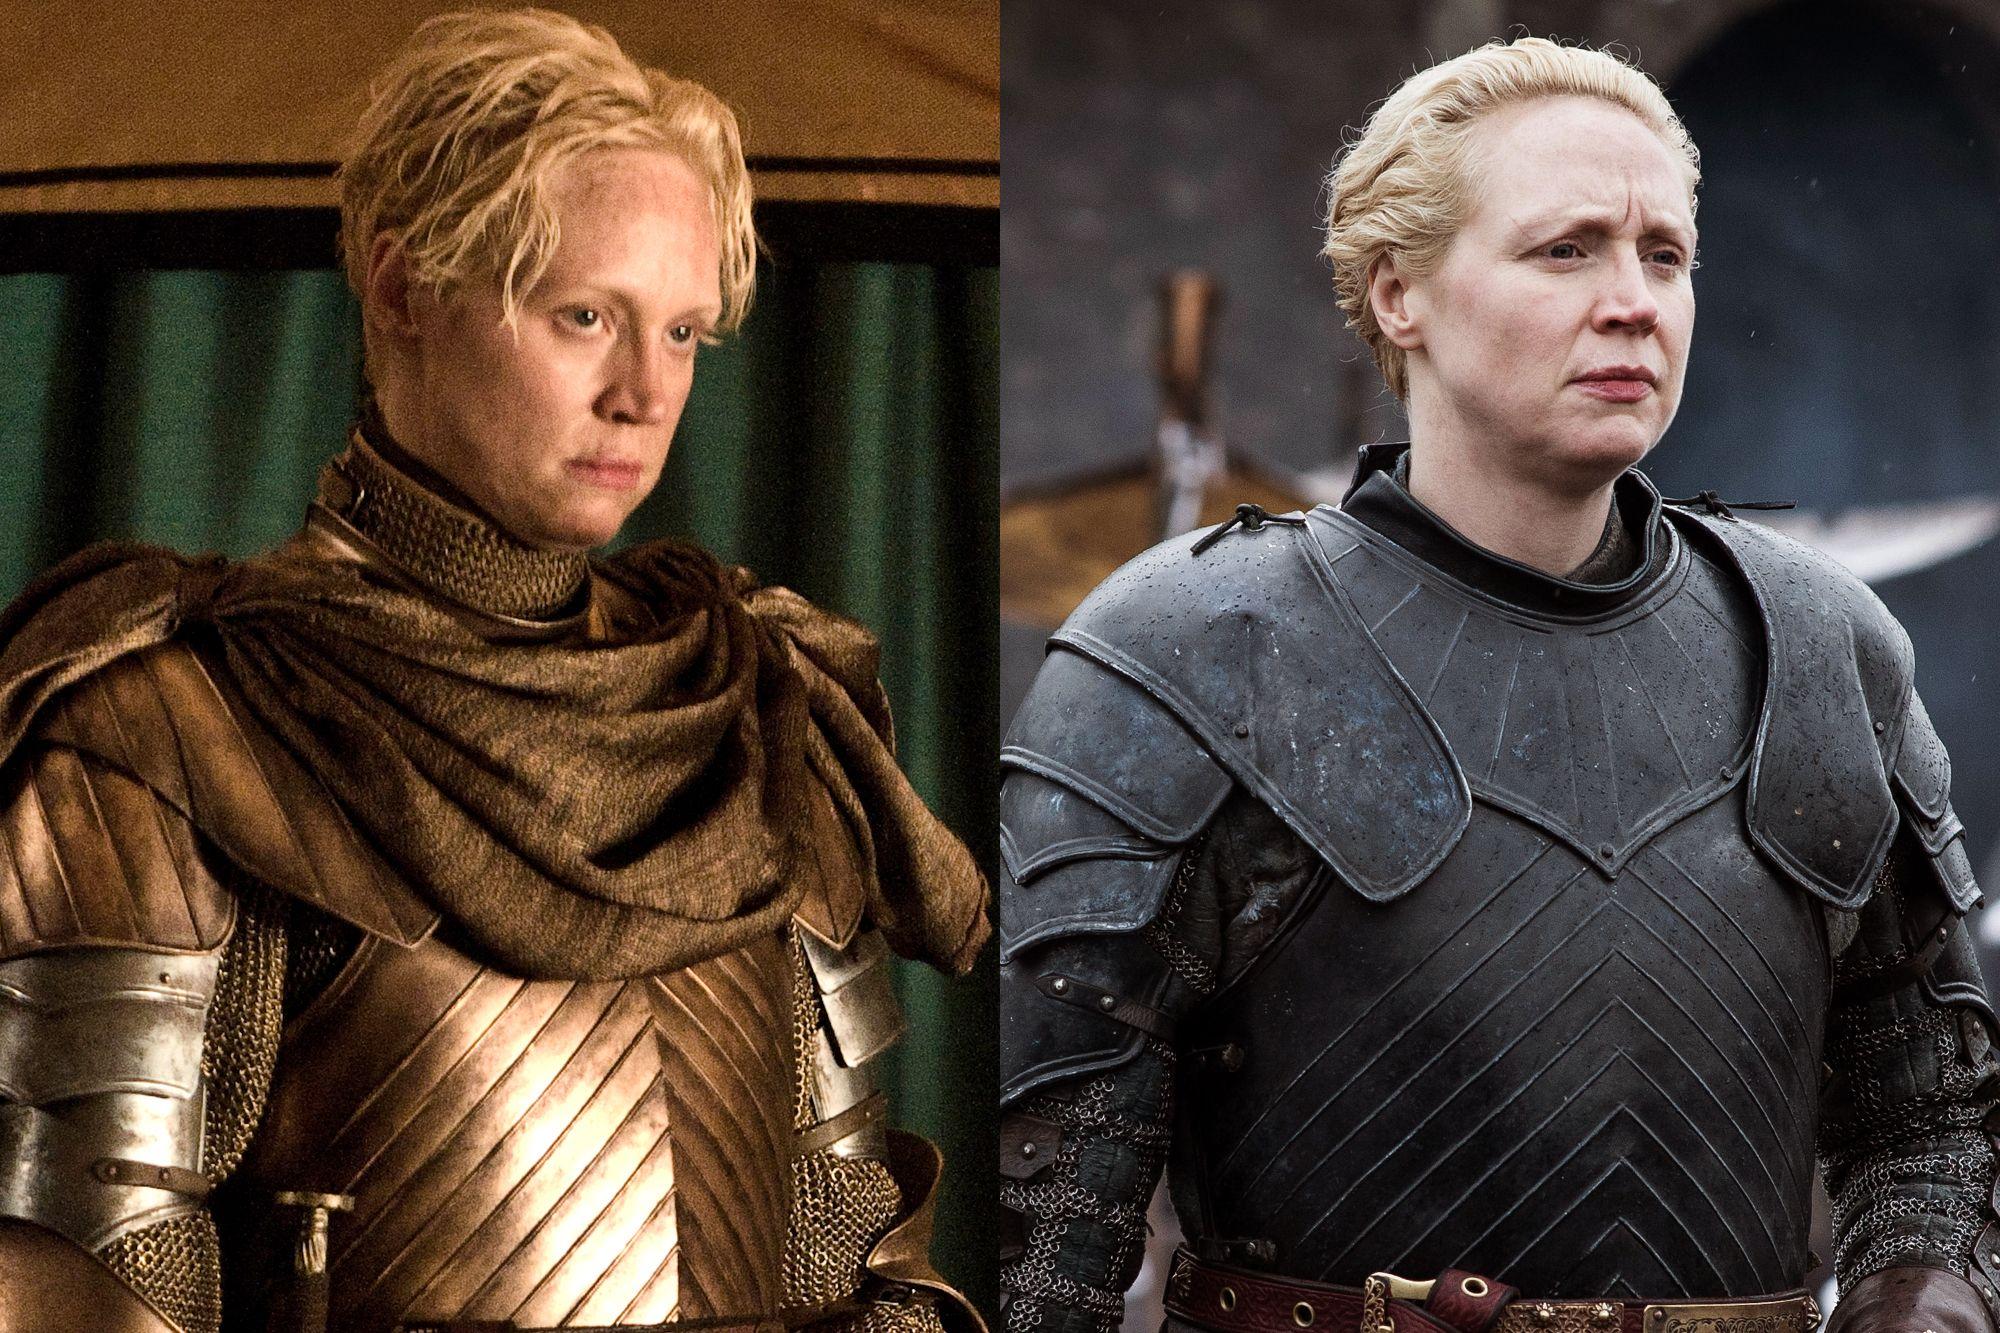 Gwendoline Christie as Brienne of Tarth Season Two to Season Eight.